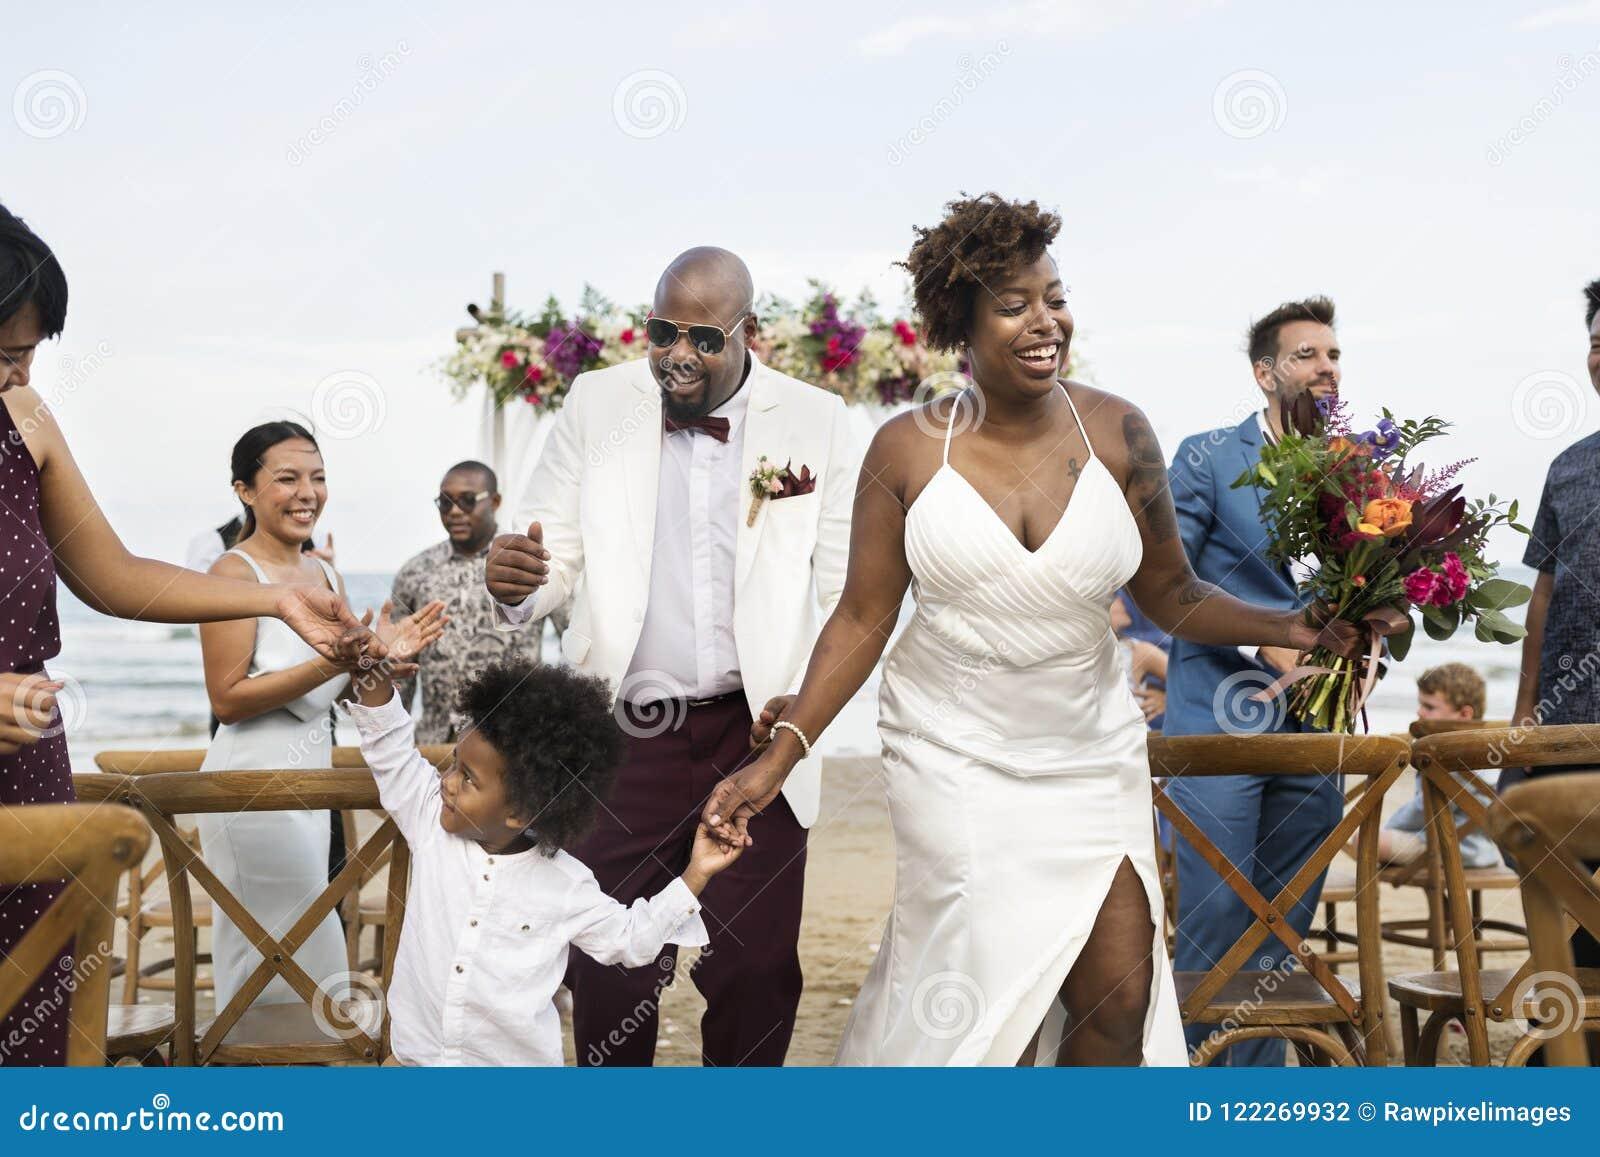 African American Wedding.African American Couple S Wedding Day Stock Photo Image Of Black